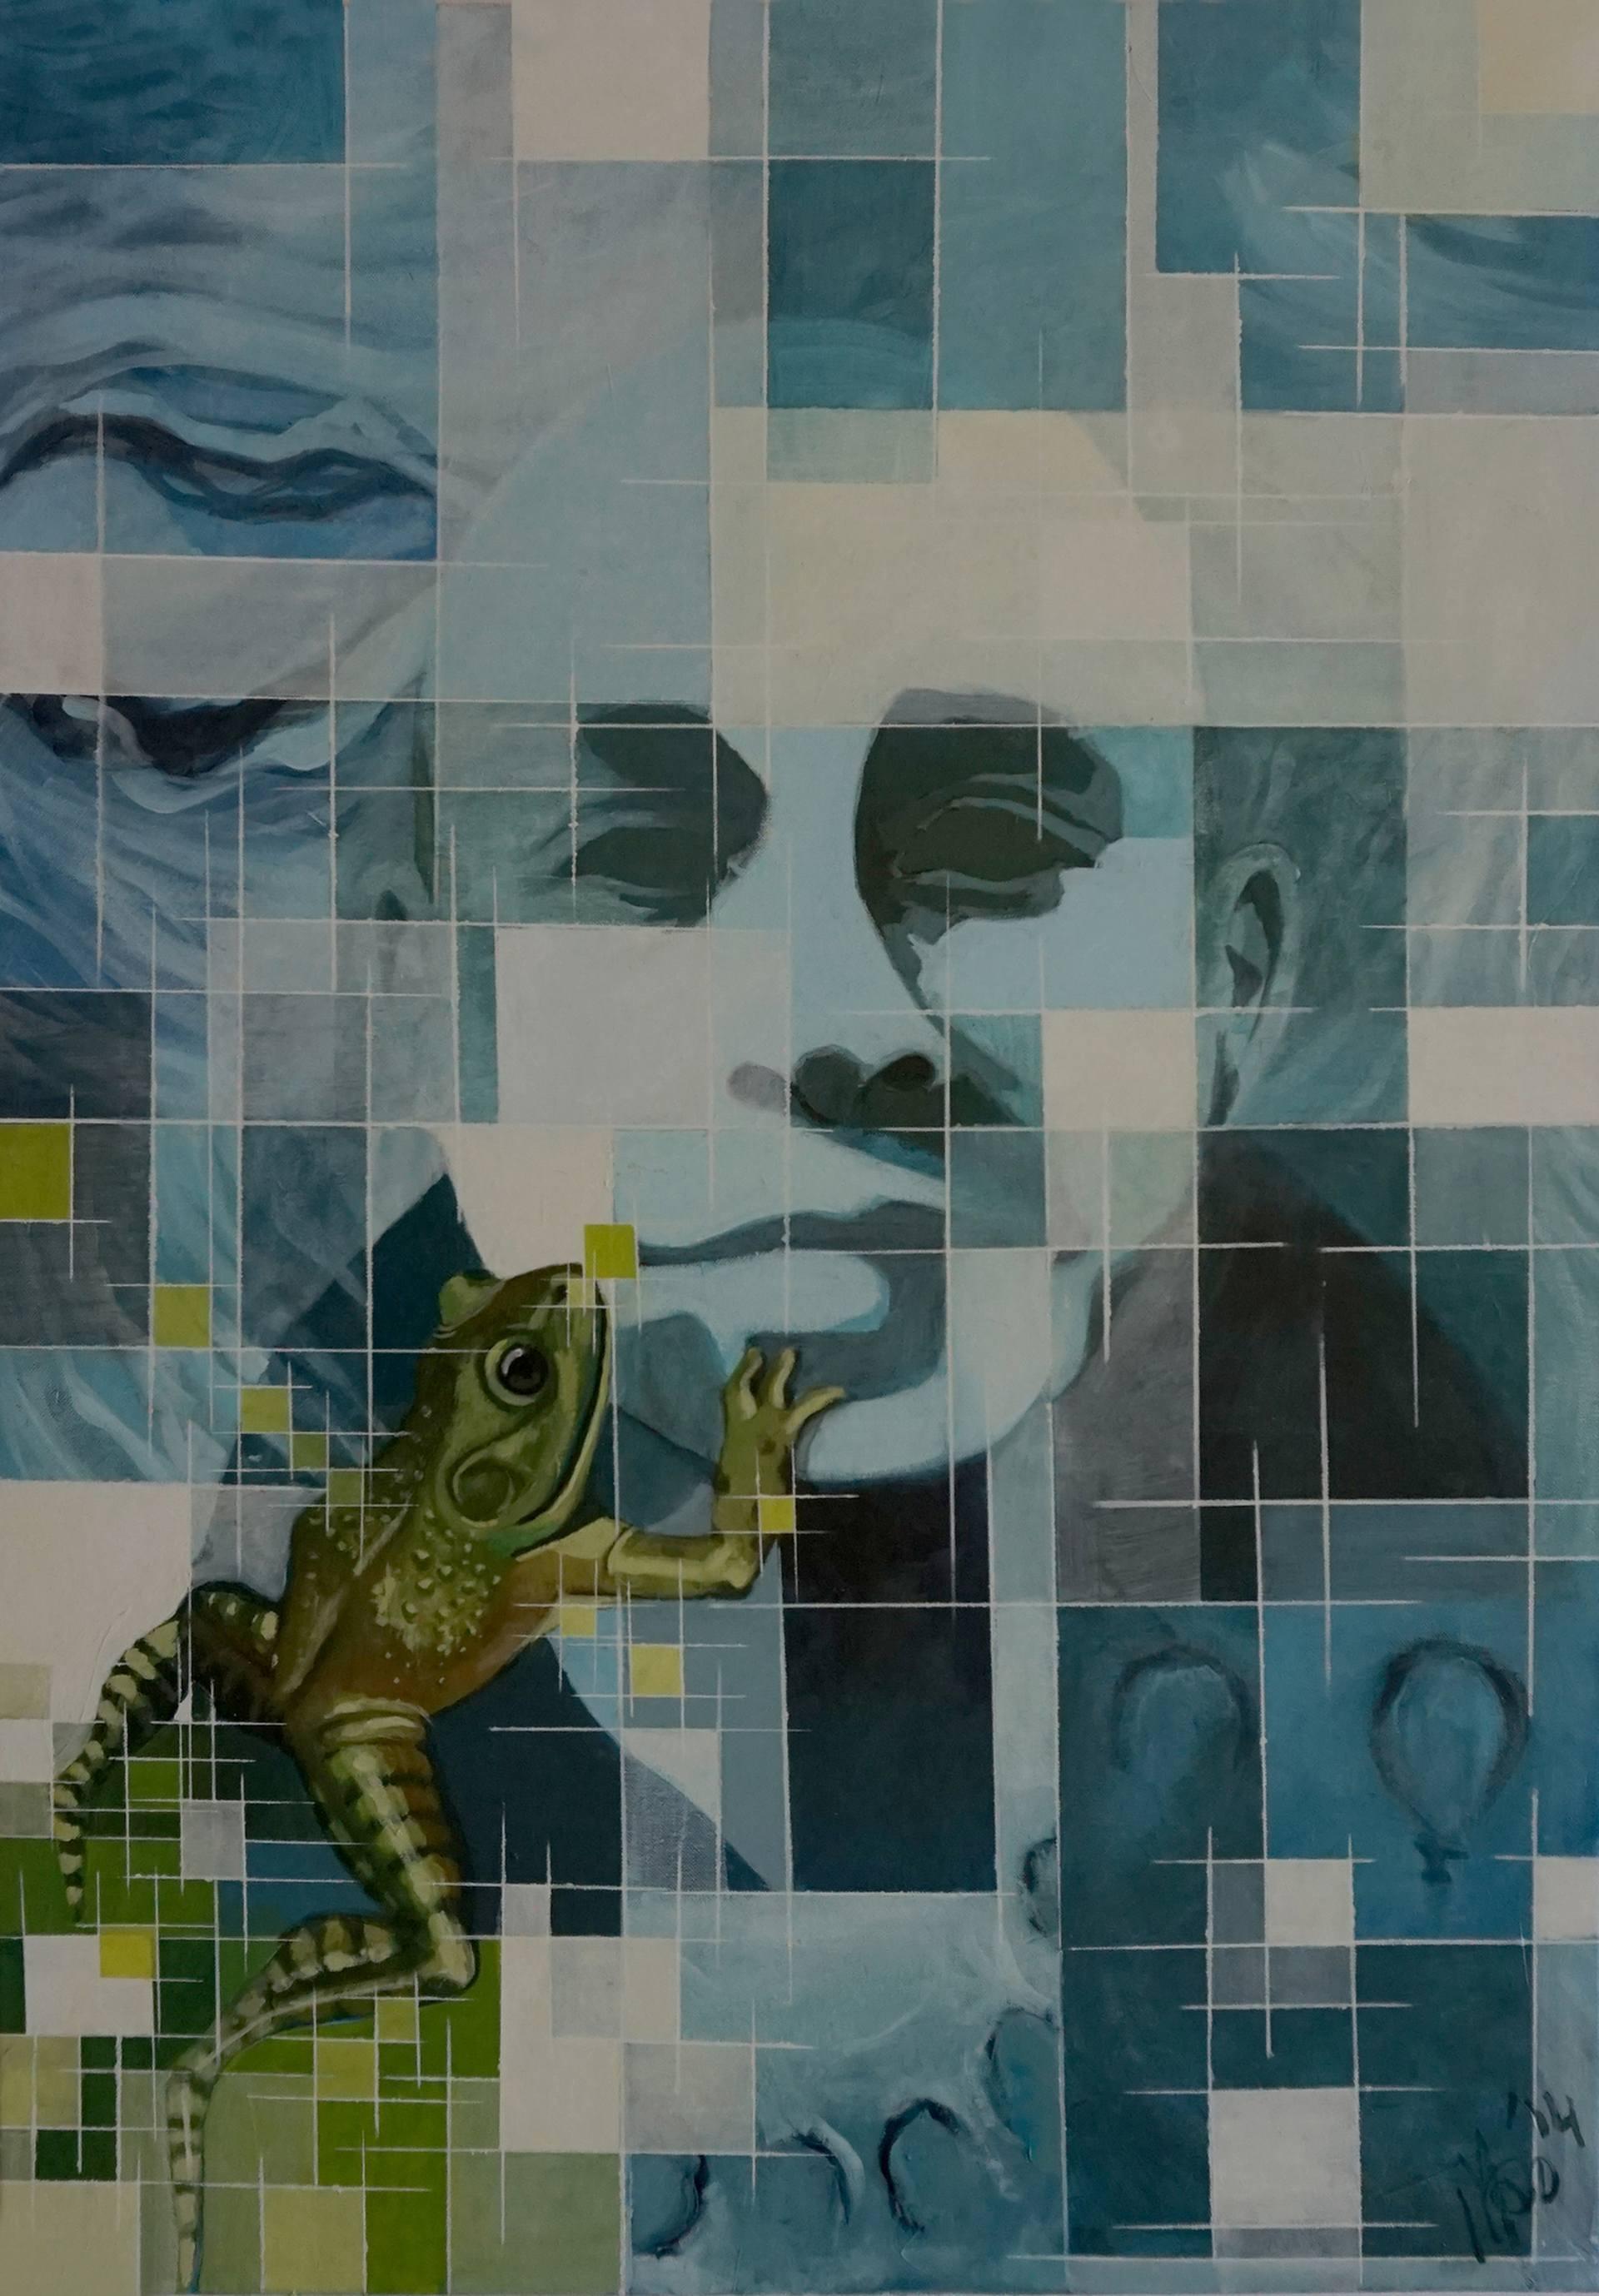 Risultati immagini per Human Nature 1.0 Painting, 39.4 H x 27.6 W x 0.6 in Marit Otto